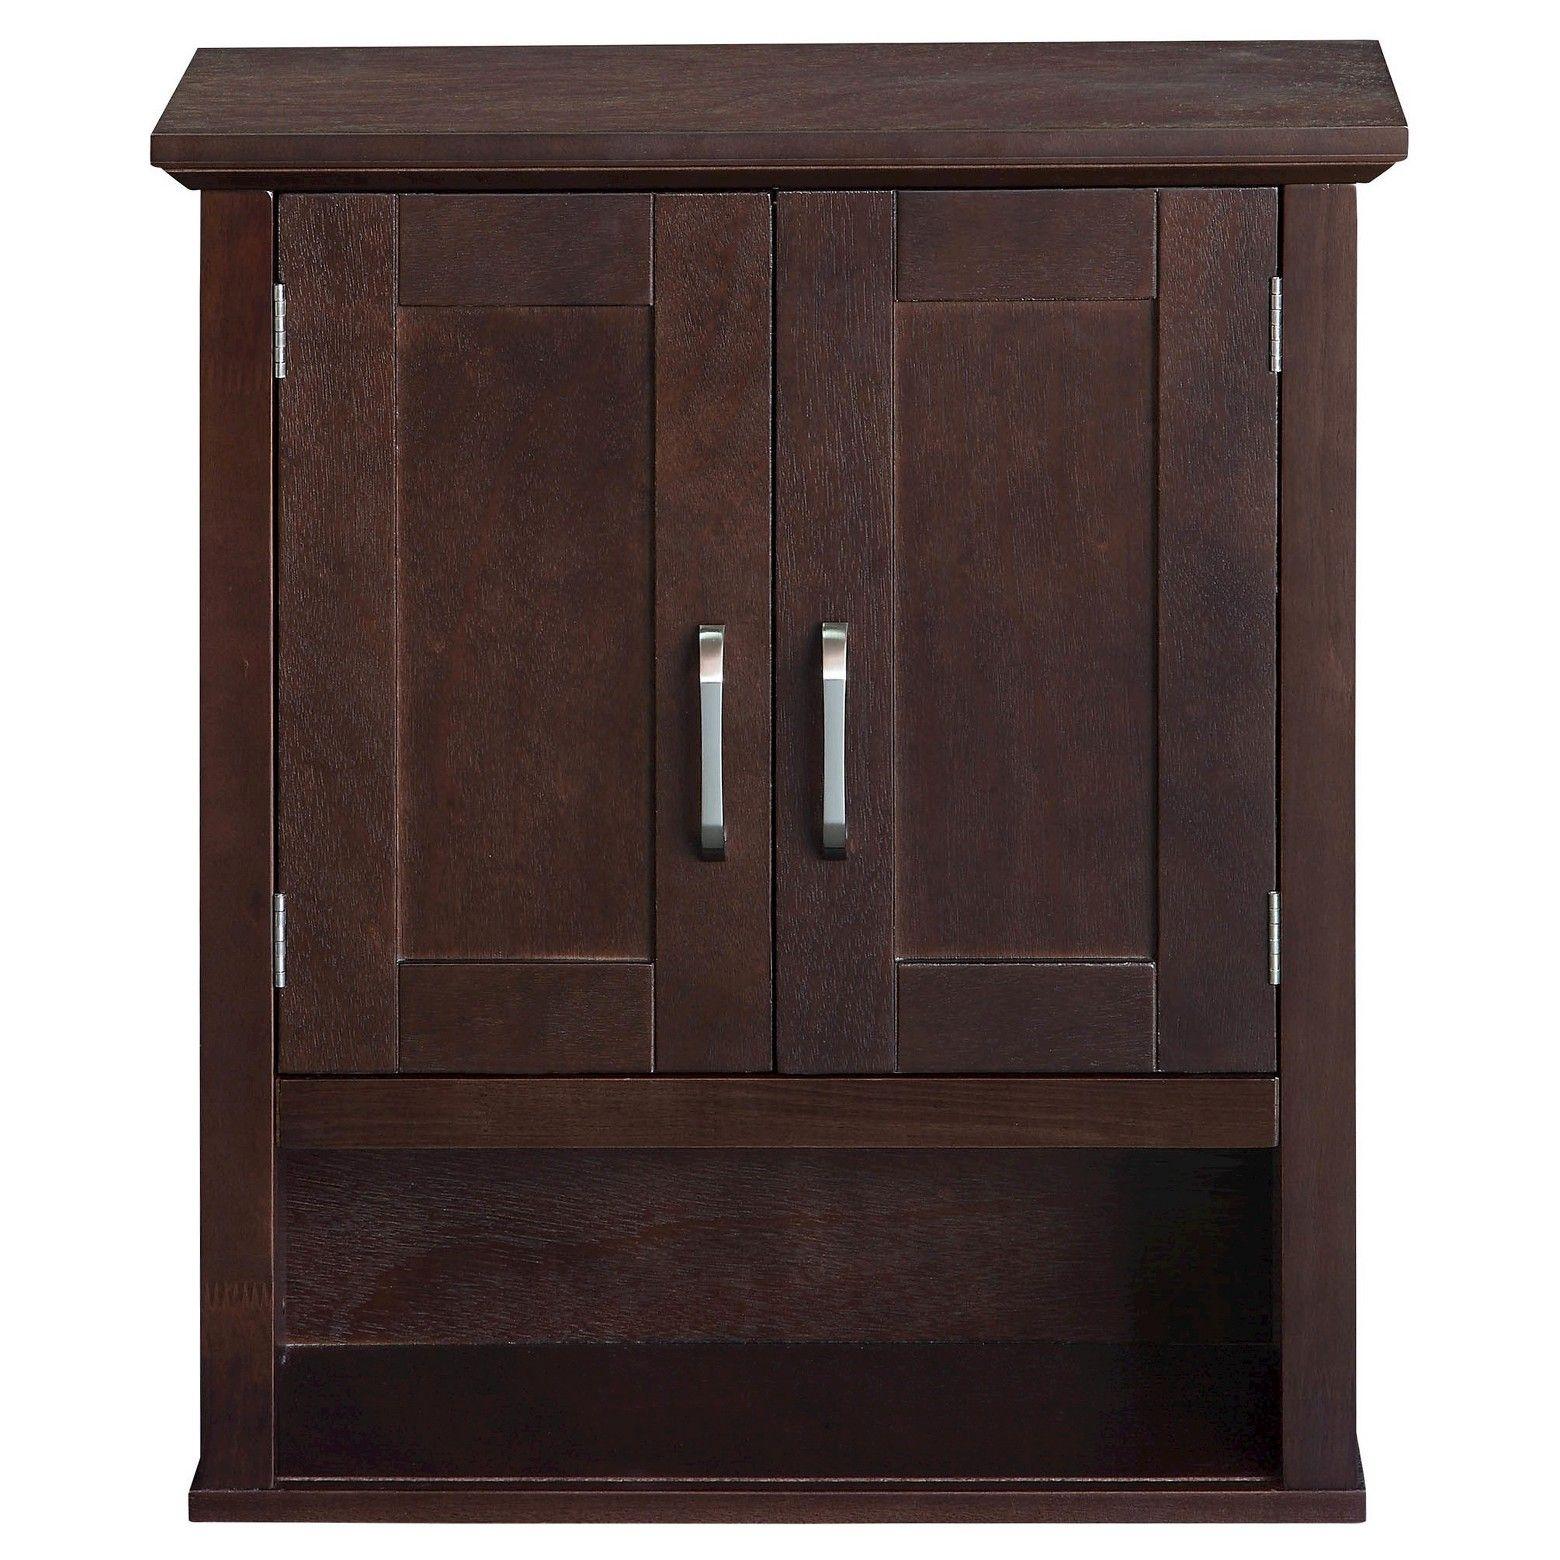 Wood Wall Cabinet Threshold Bathroom Shelf Decor Wood Wall Cabinet Shelving